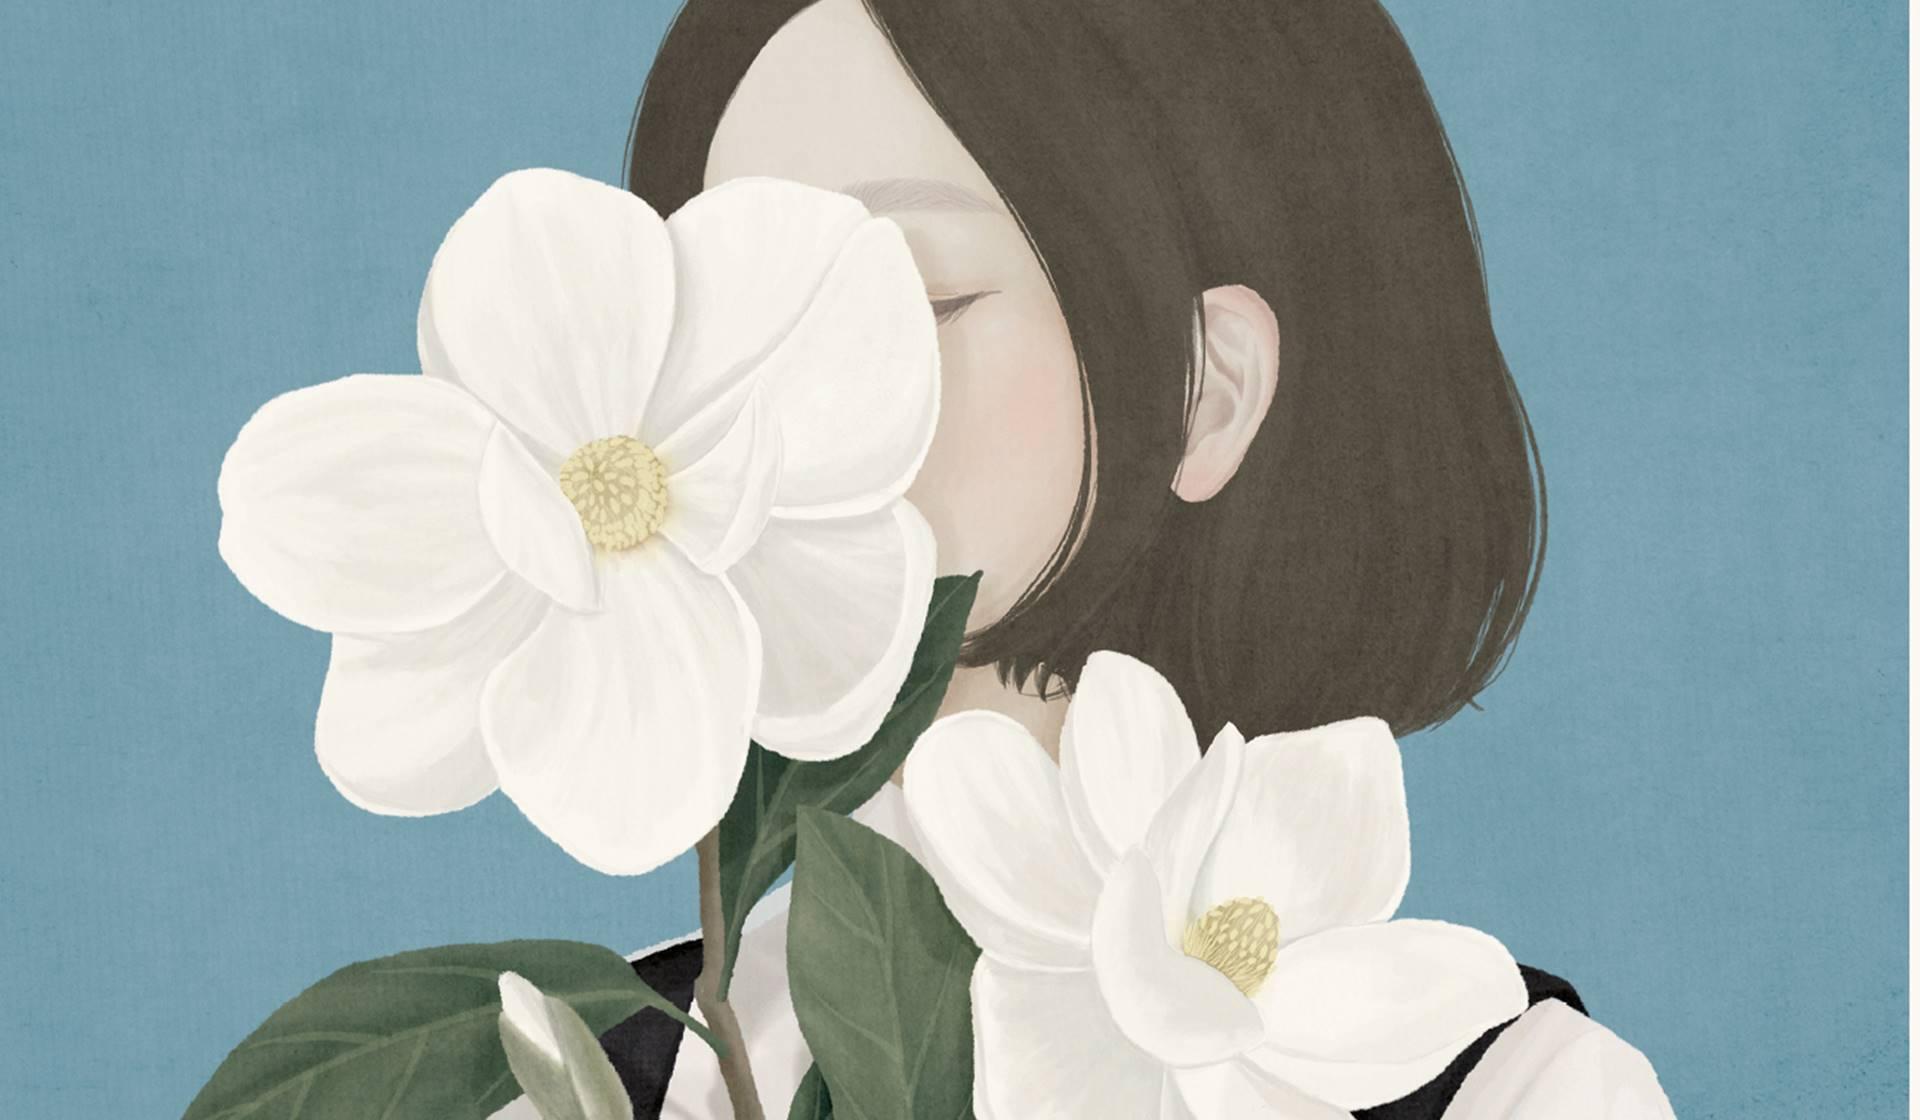 'Agujero', de Hiroko Oyamada